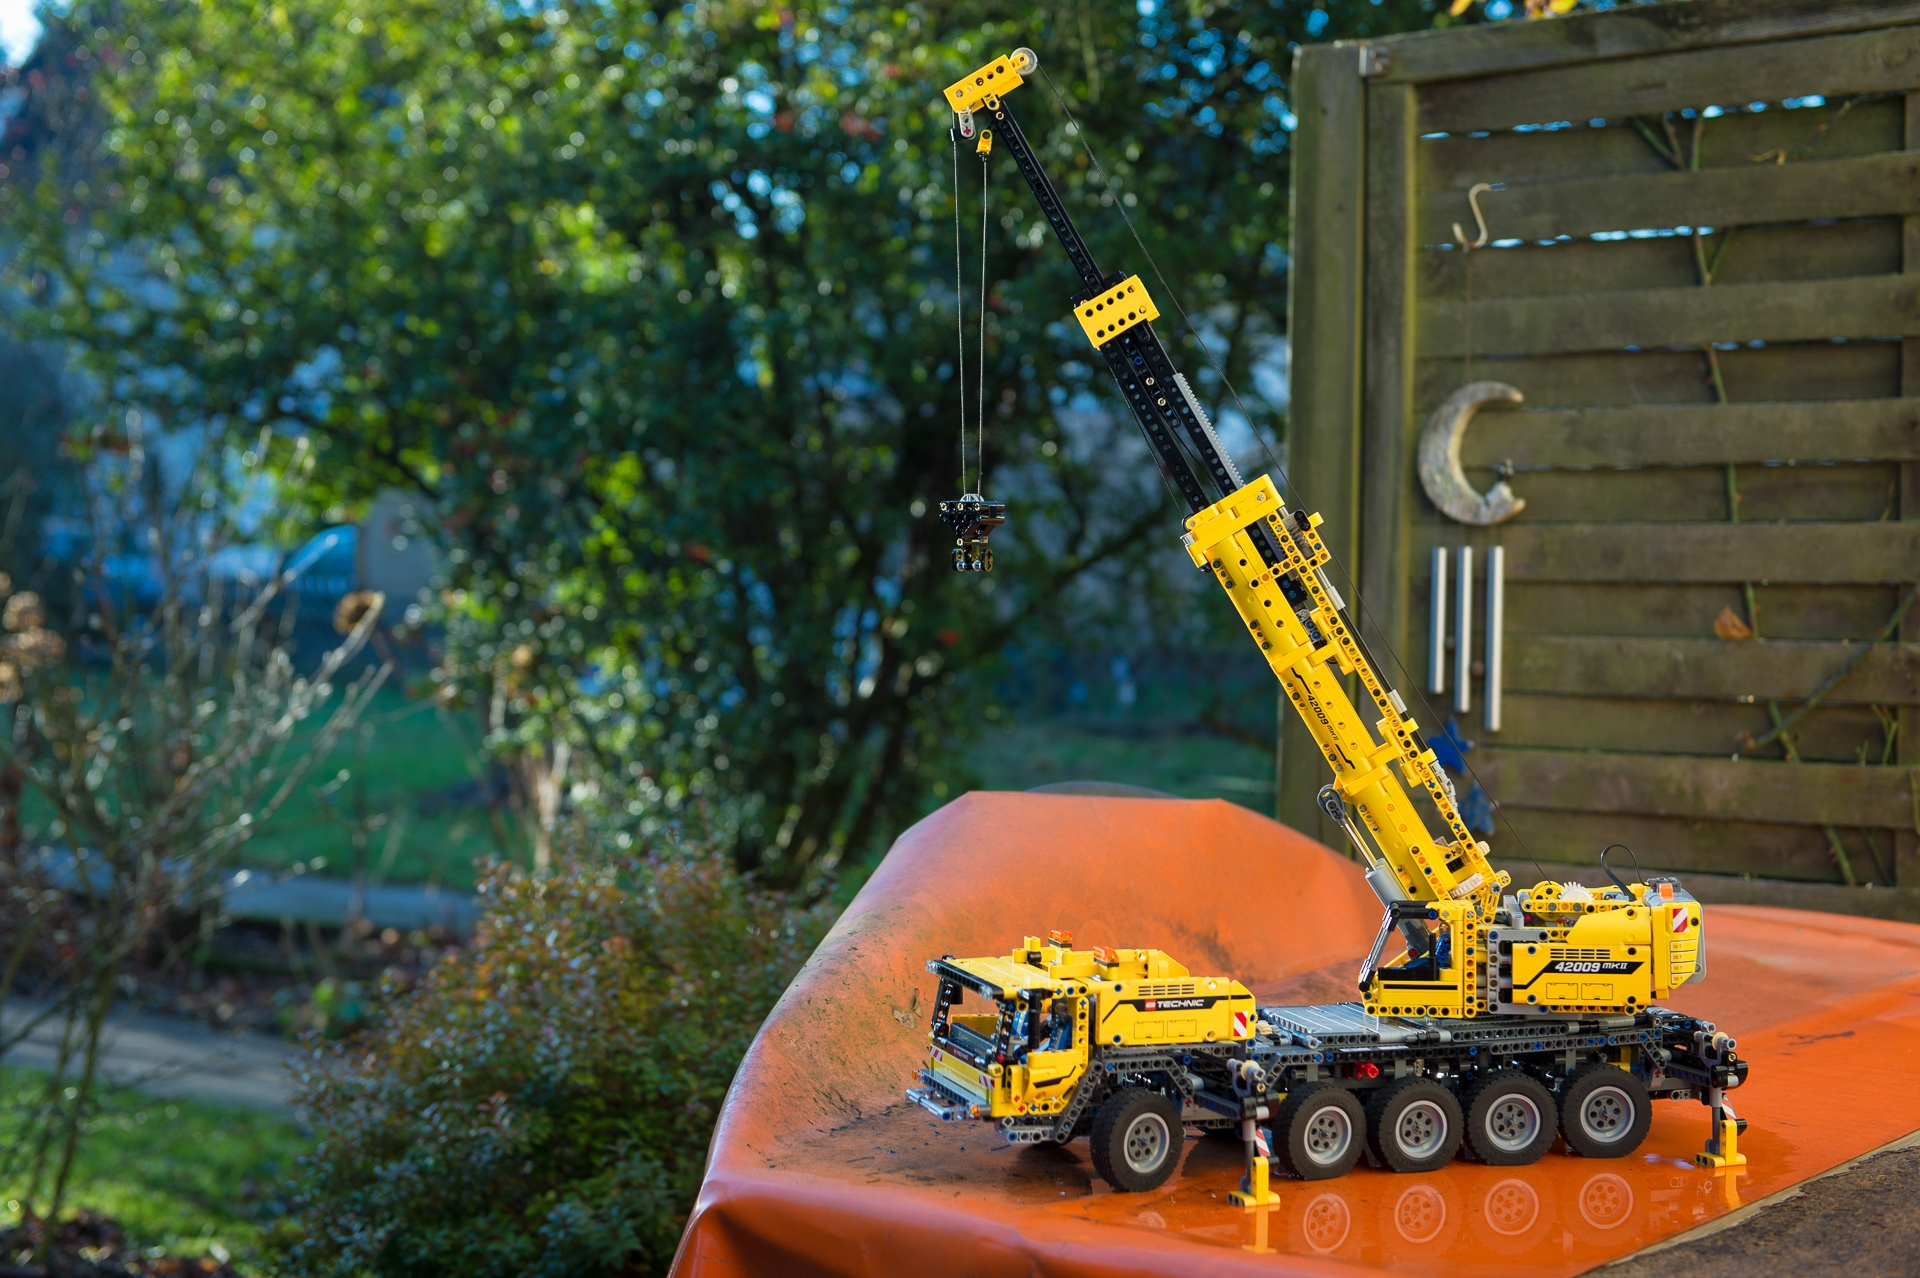 lego-technic-42009-mobiler-schwerlastkran-zusammengebaut-14